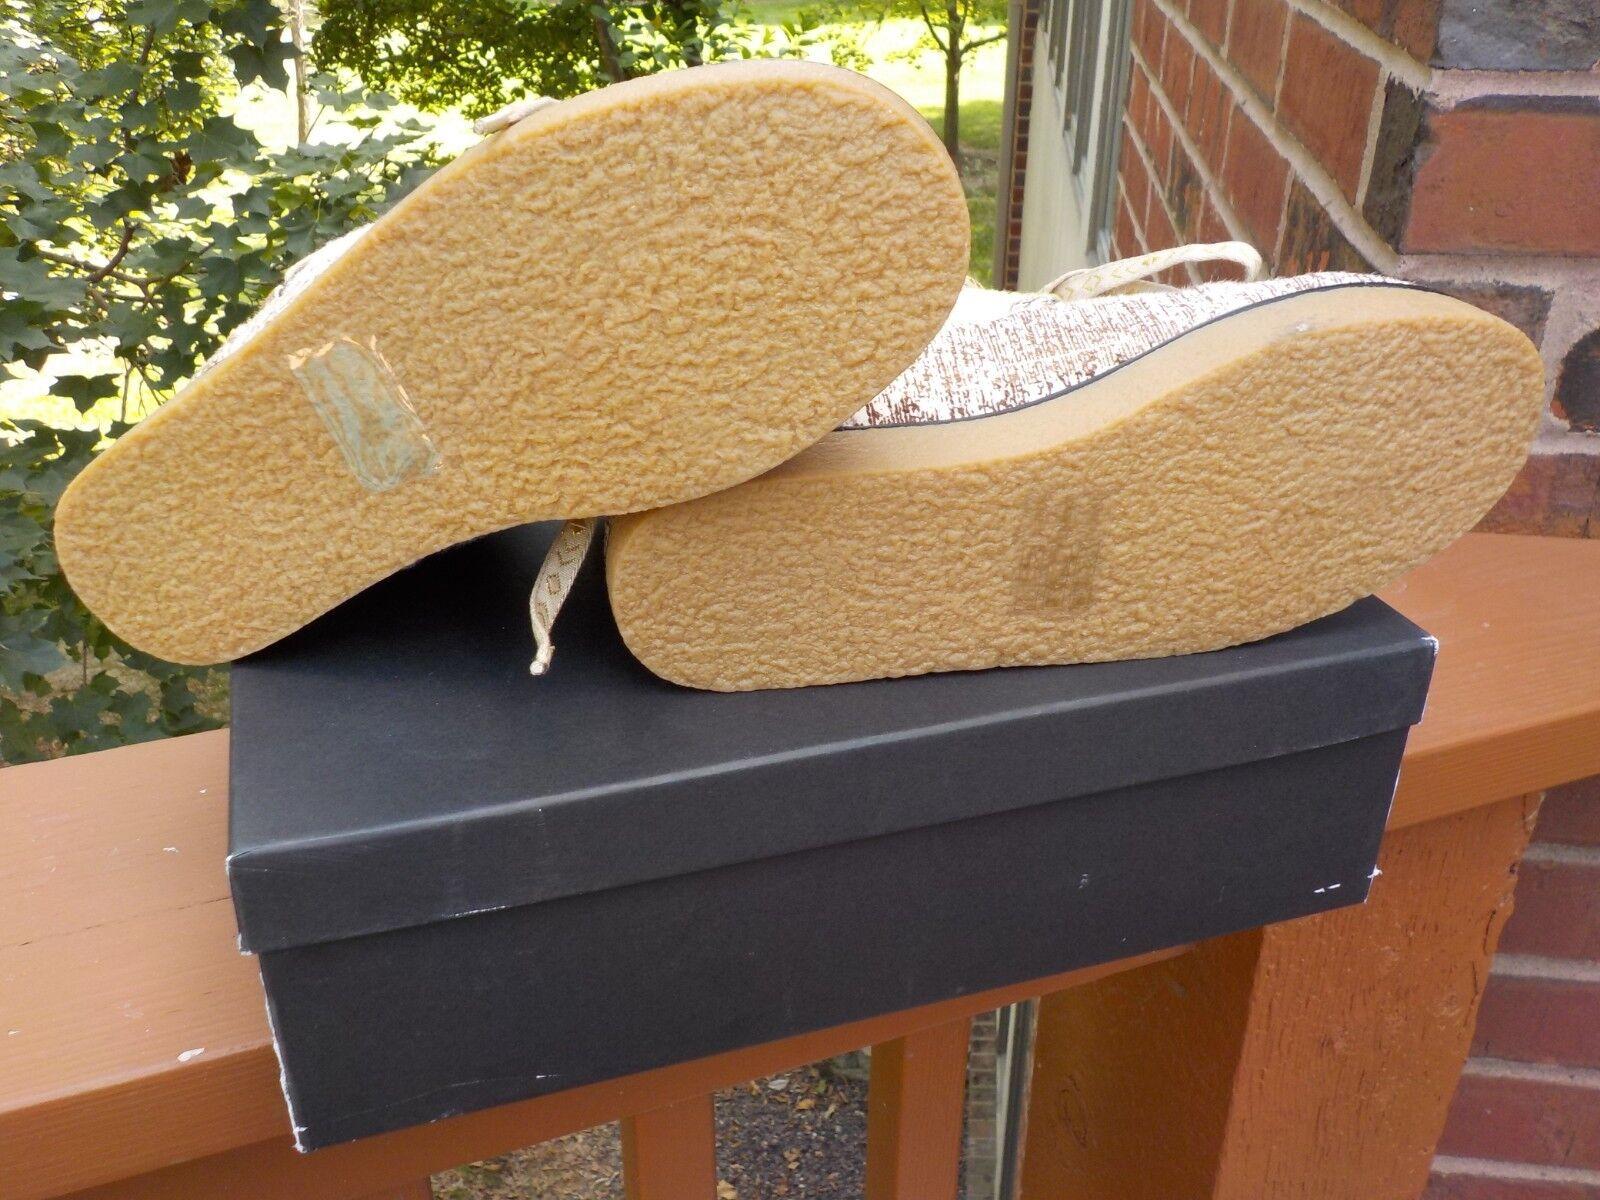 NIB House of Harlow Sadie Ivory Leder Shearling Ankle Alpine Ankle Shearling Stiefel Damens SZ 9 ccebb4